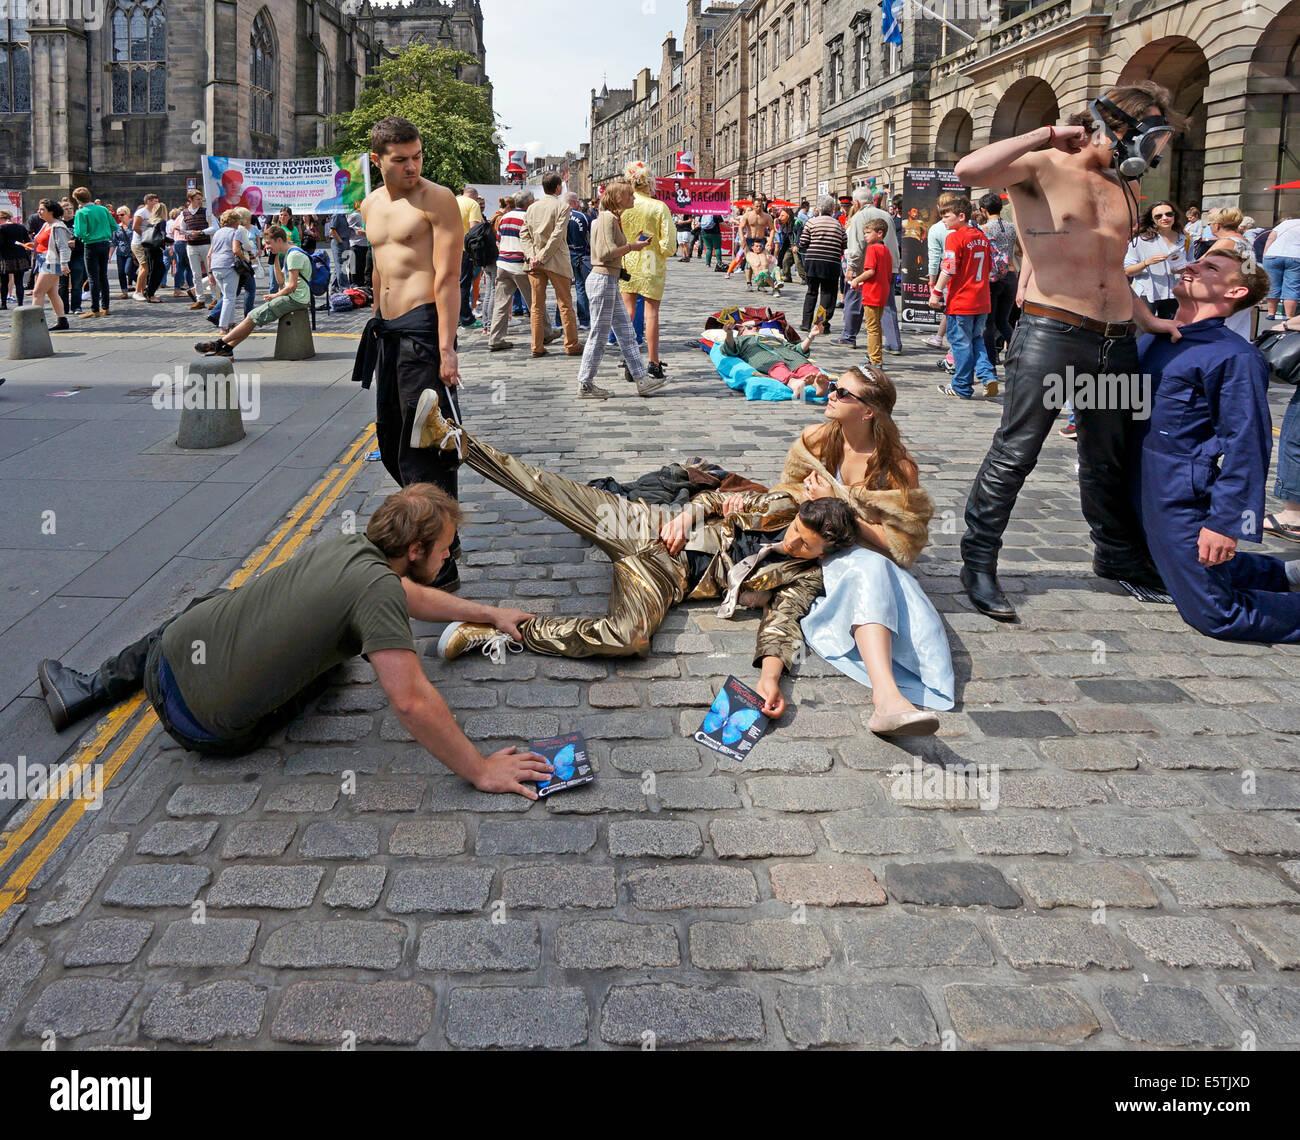 Edinburgh Fringe Festival 2014 Performers in High Street The Royal Mile Edinburgh Scotland - Stock Image